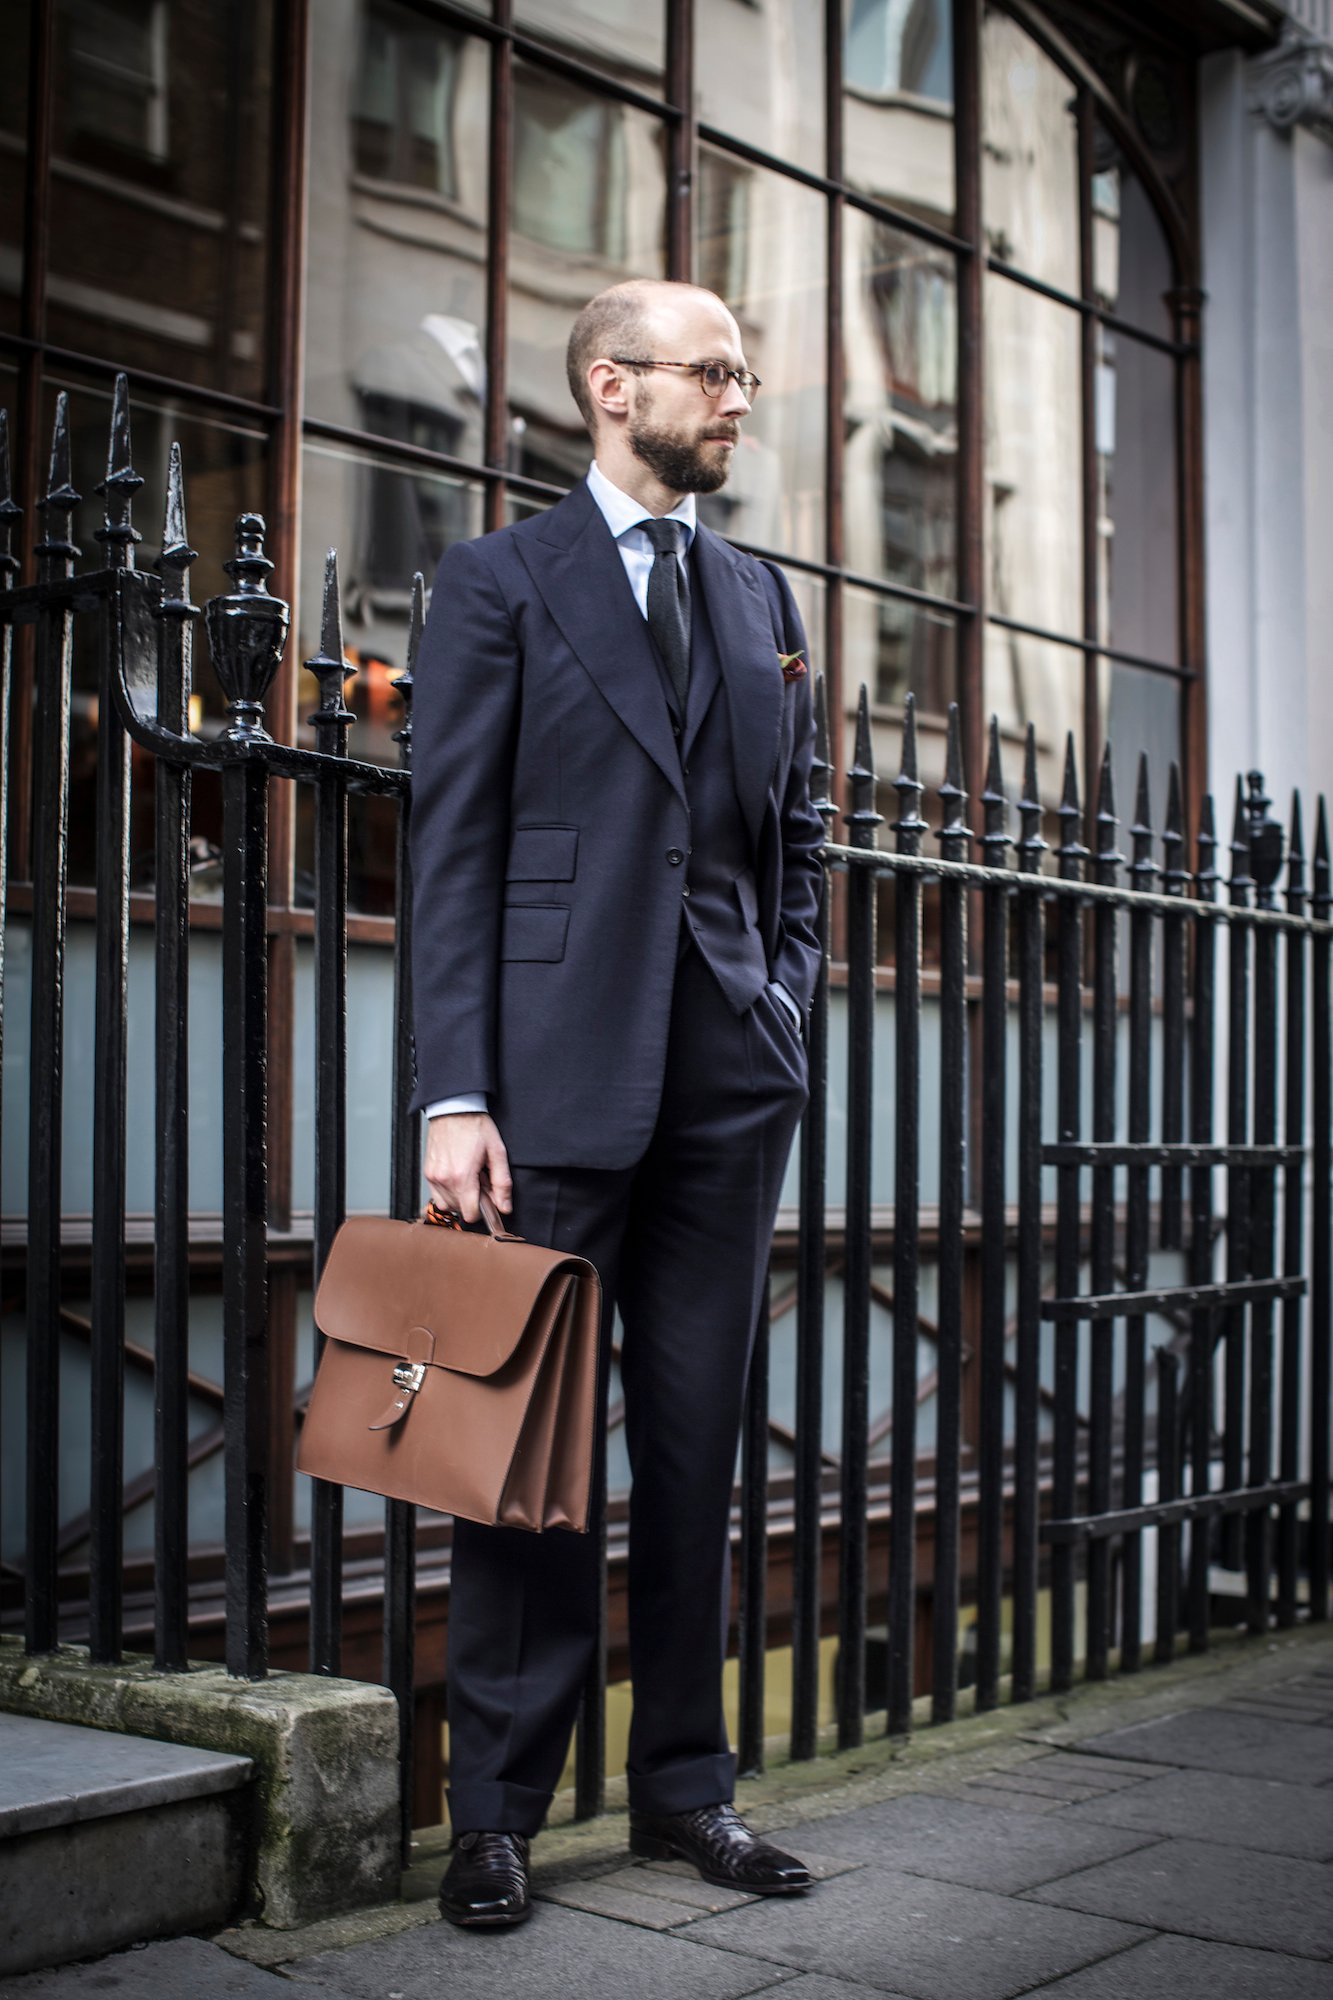 Chittleborough & Morgan suit – at A&S